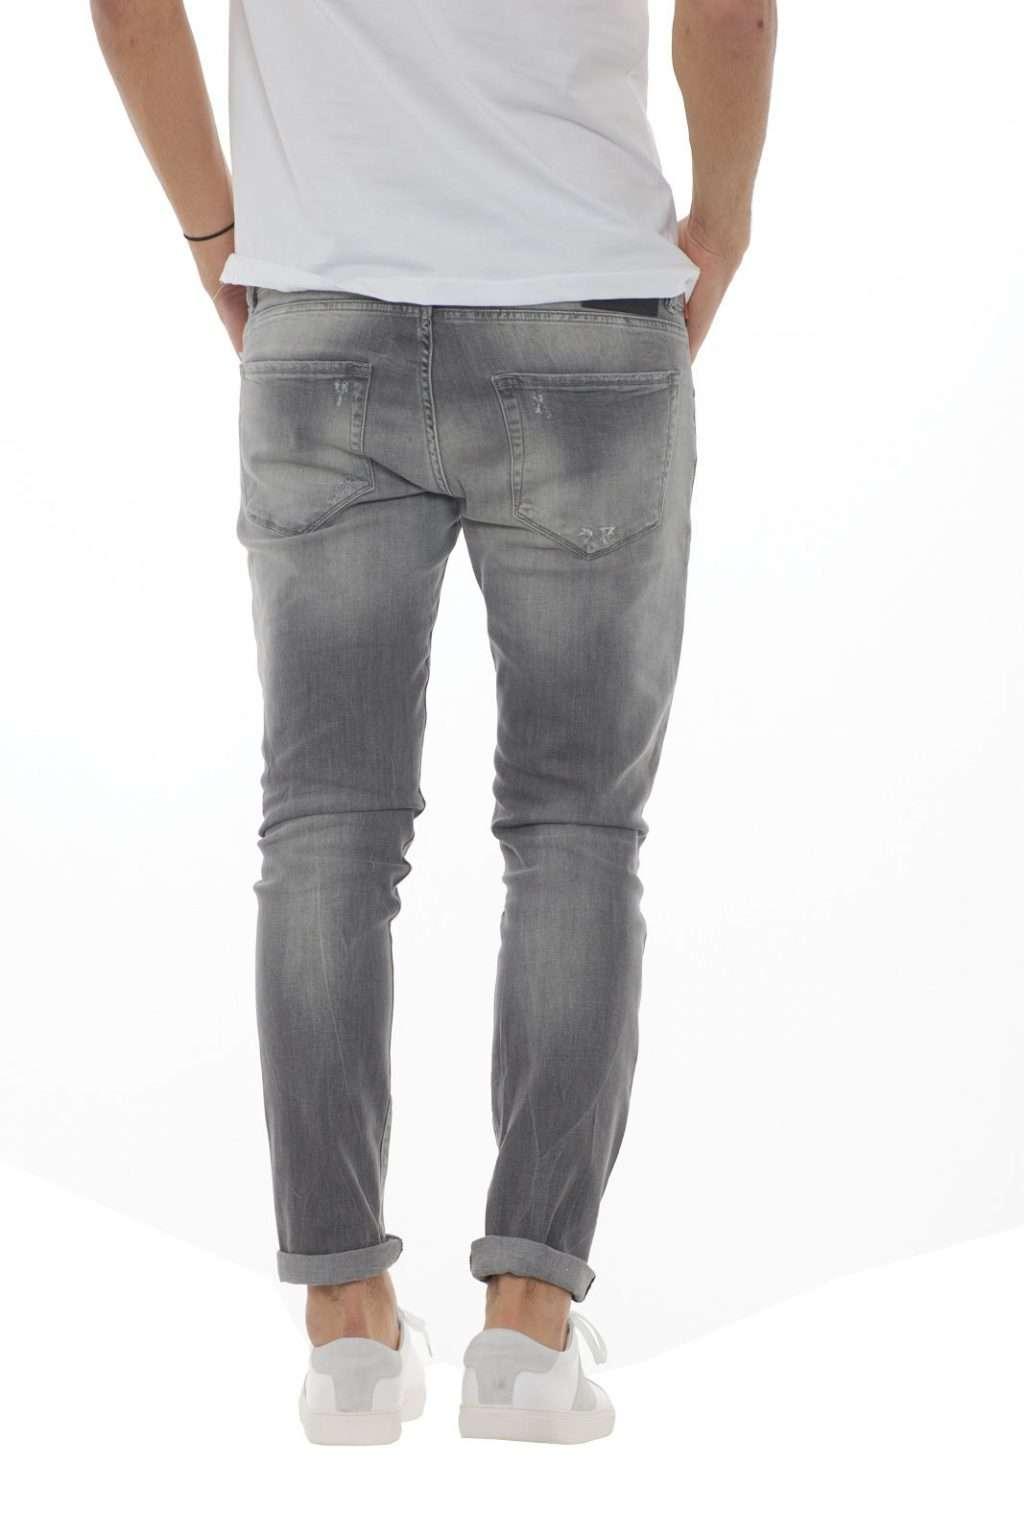 https://www.parmax.com/media/catalog/product/a/i/PE-outlet_parmax-denim-uomo-Clink-Jeans-London-MARTIN-C.jpg